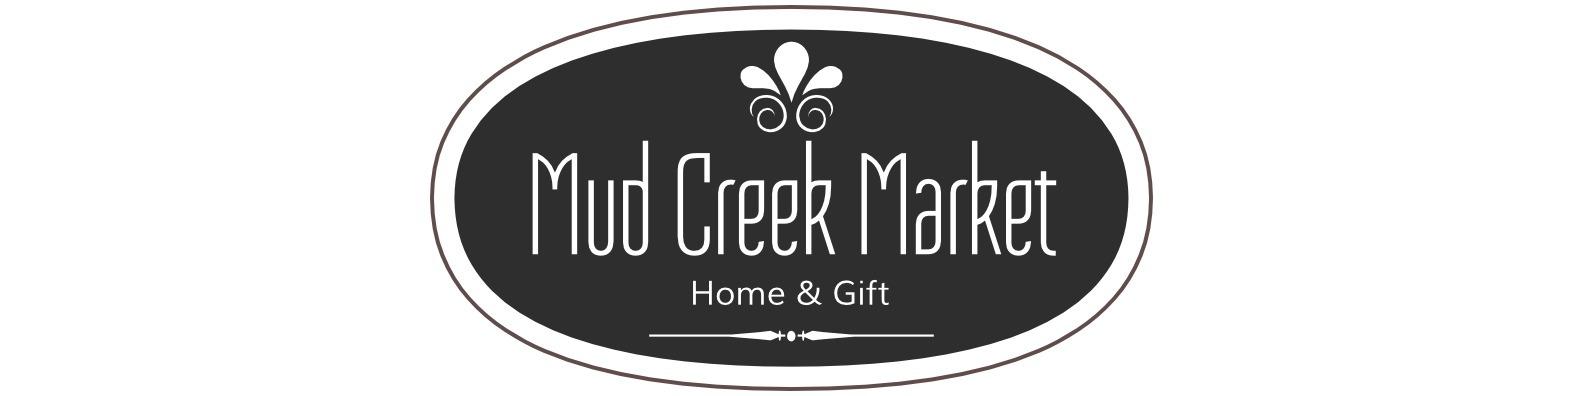 Mud Creek Market